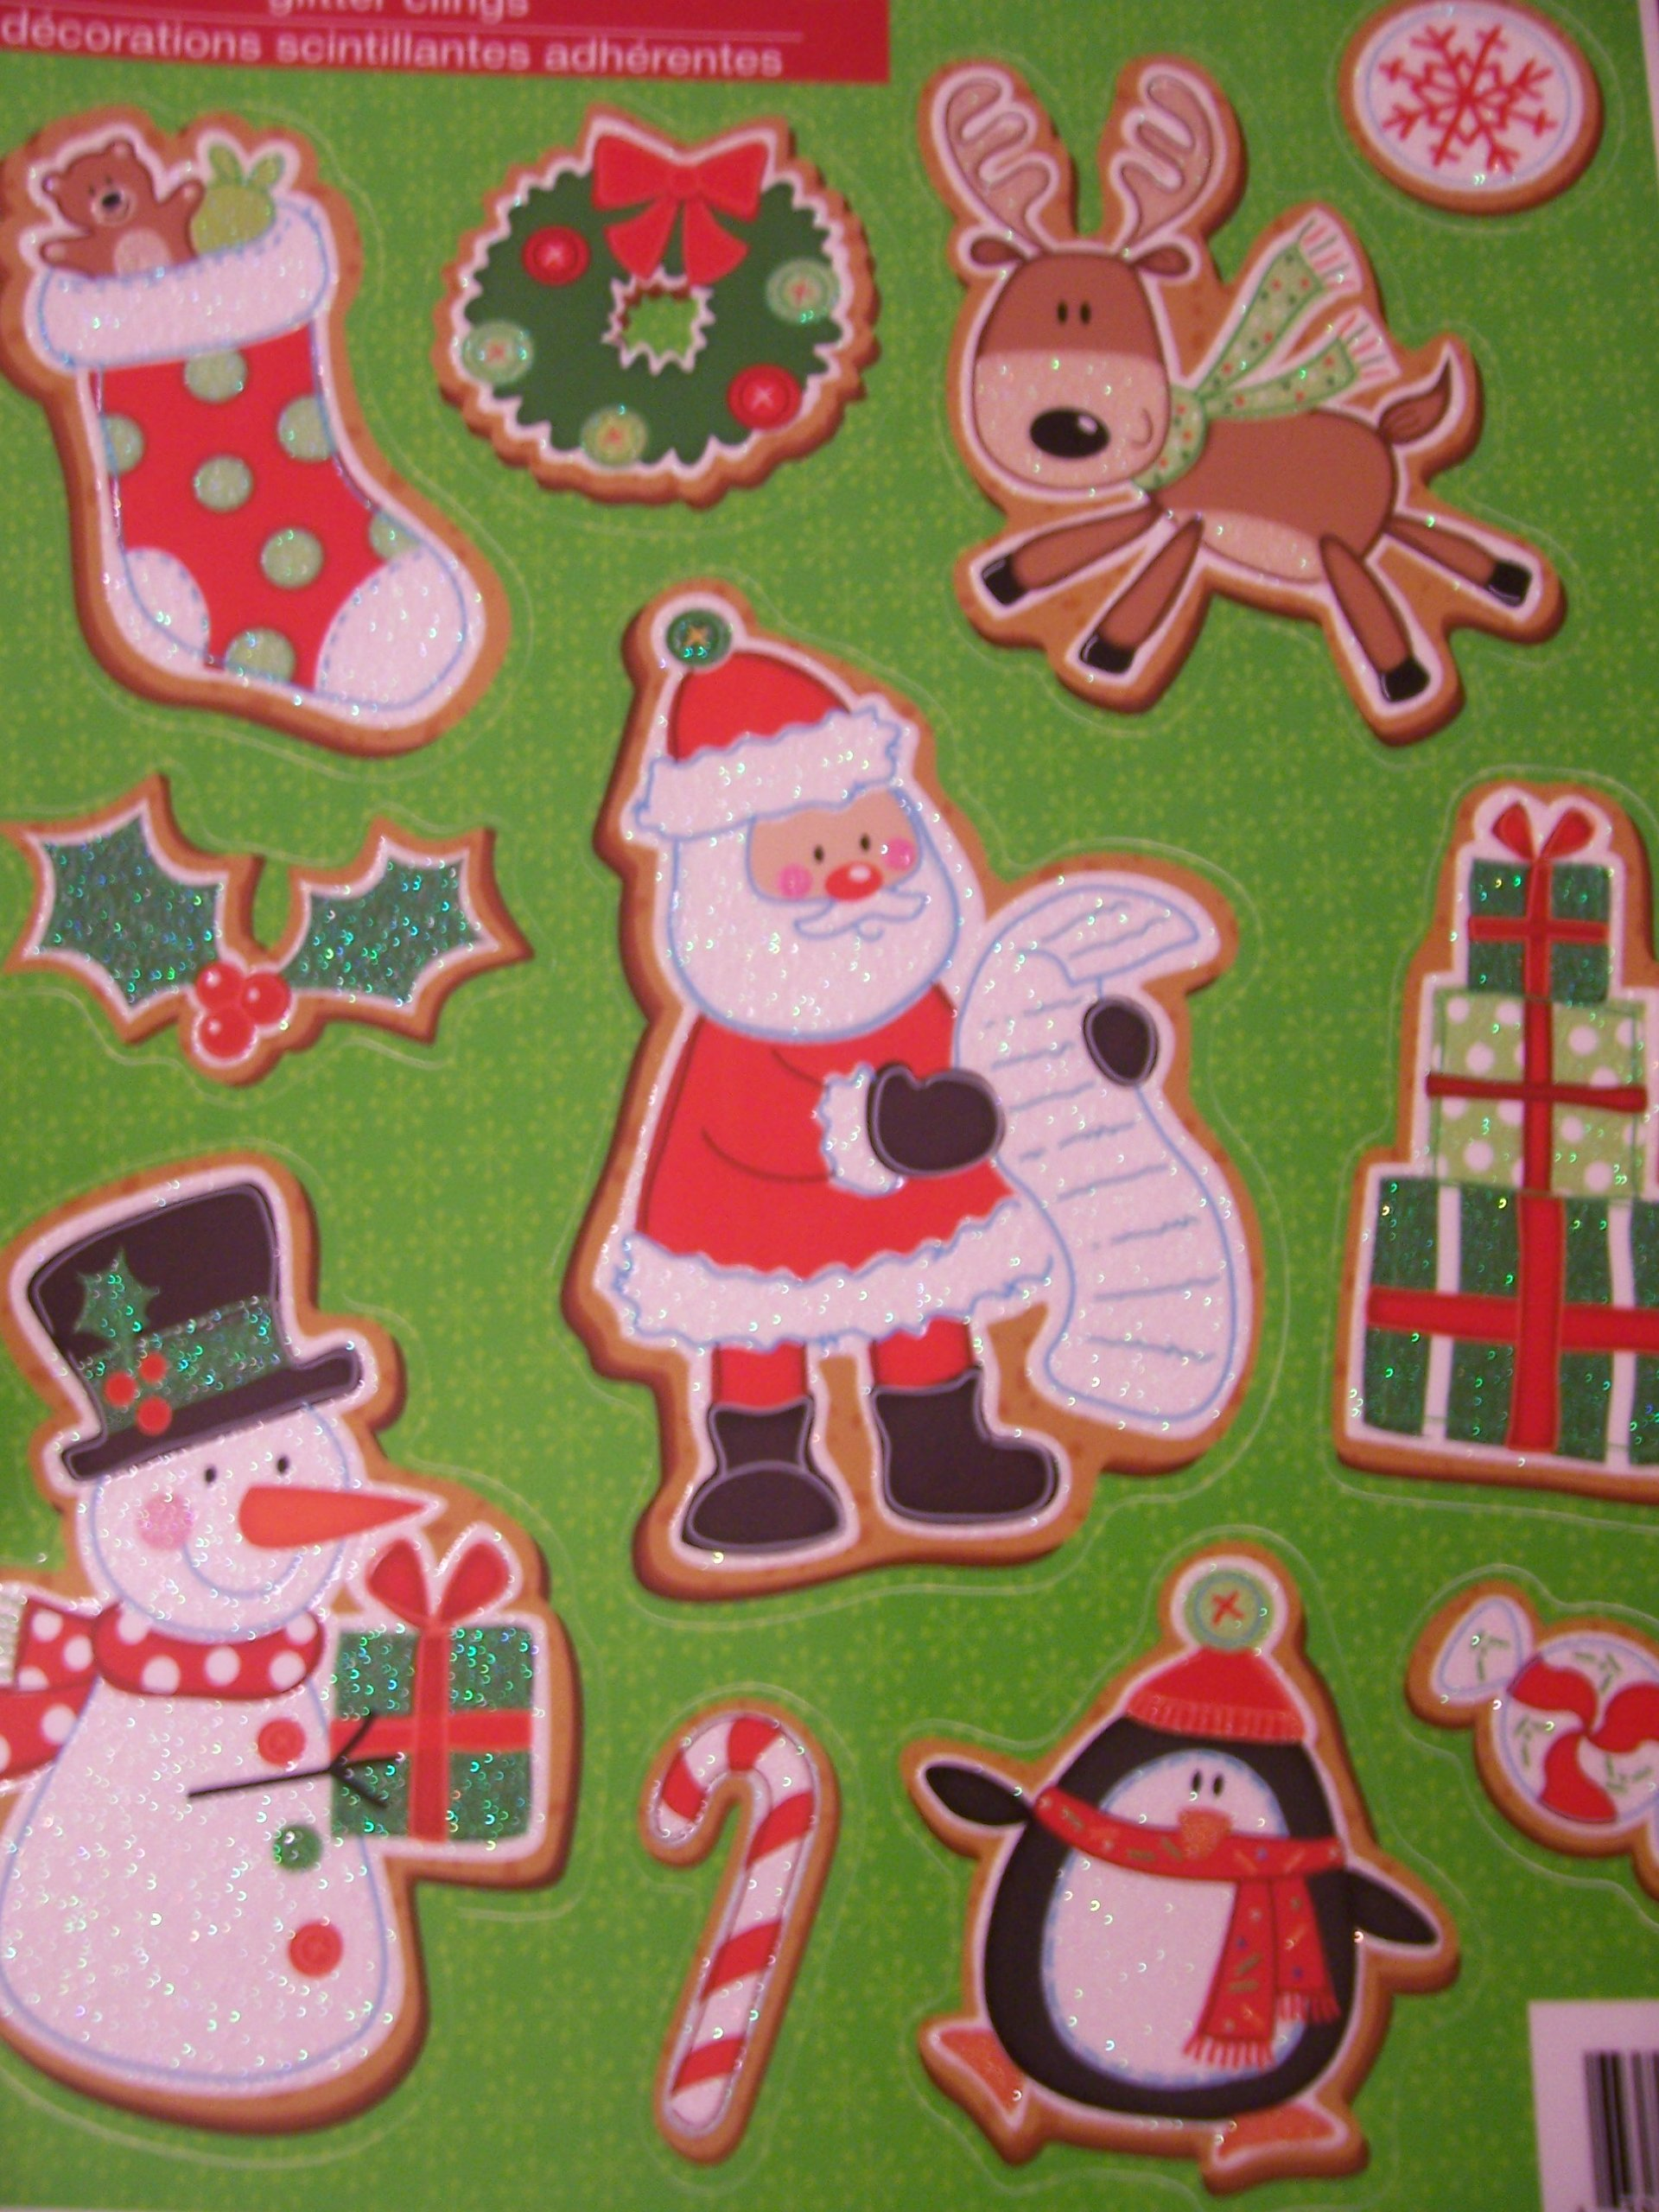 Christmas Reusable Glitter Window Clings ~ Santa, Rindeer, Penguin, Snowman, and more! (11 Clings)